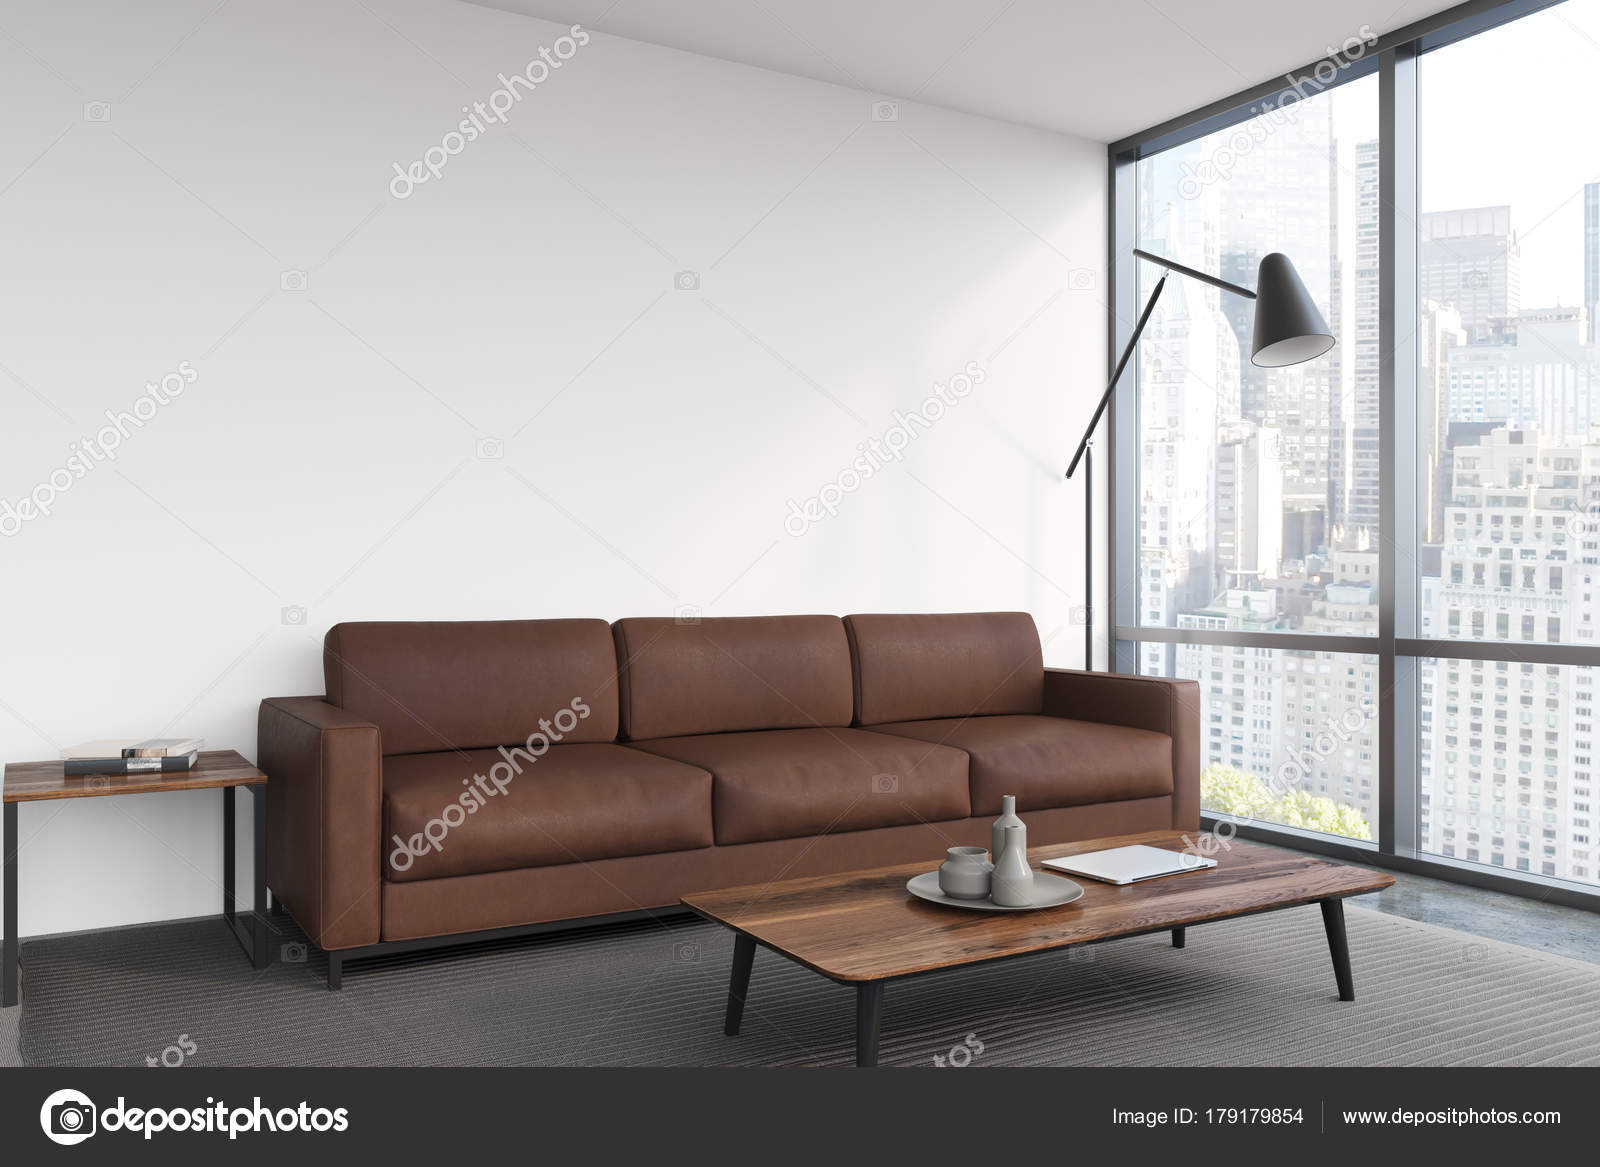 Woonkamer Bruin Wit : Wit woonkamer bruin sofa poster u stockfoto denisismagilov